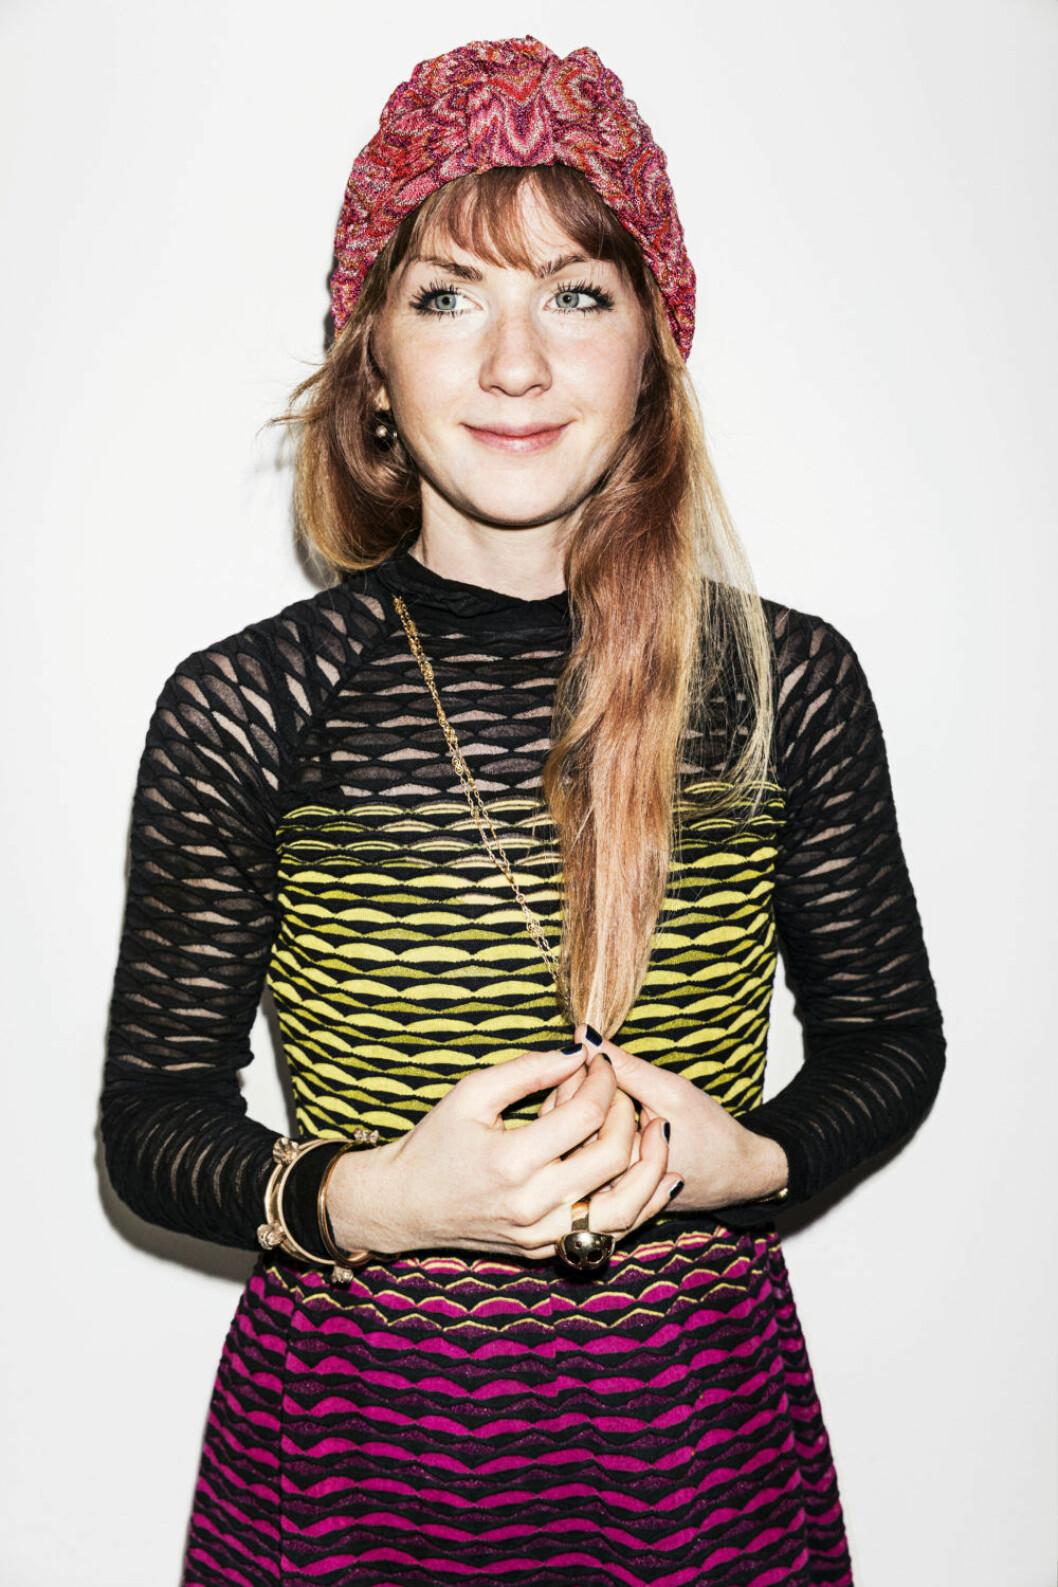 Krista Kretzschmar